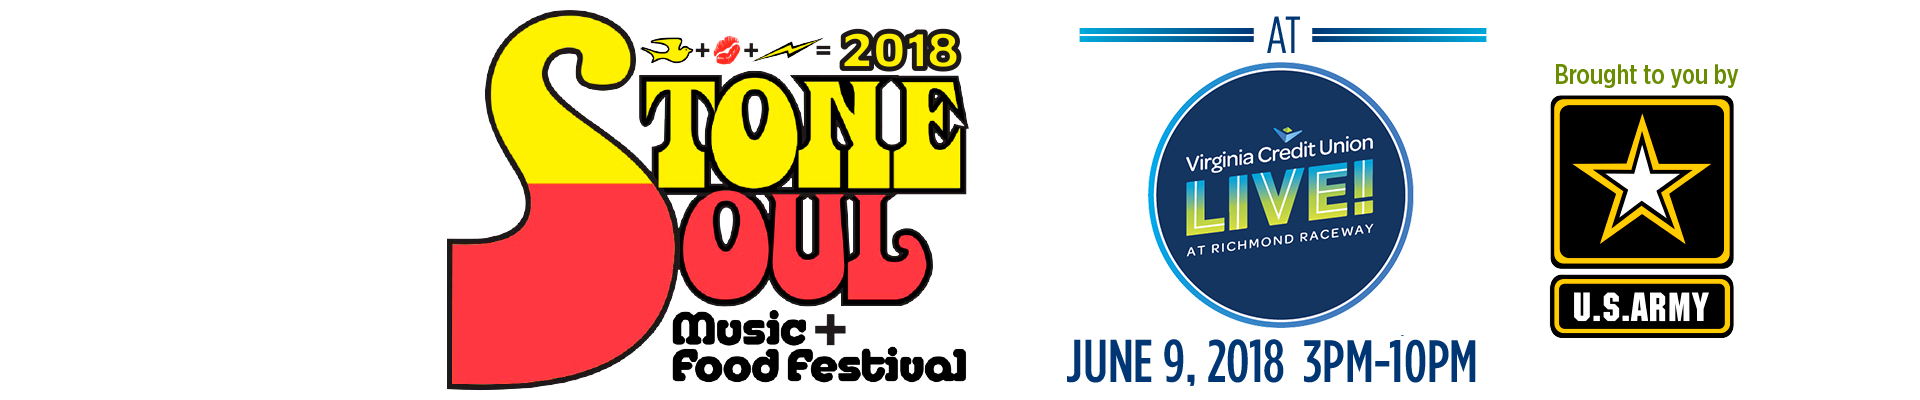 Stone Soul 2018 Header copy